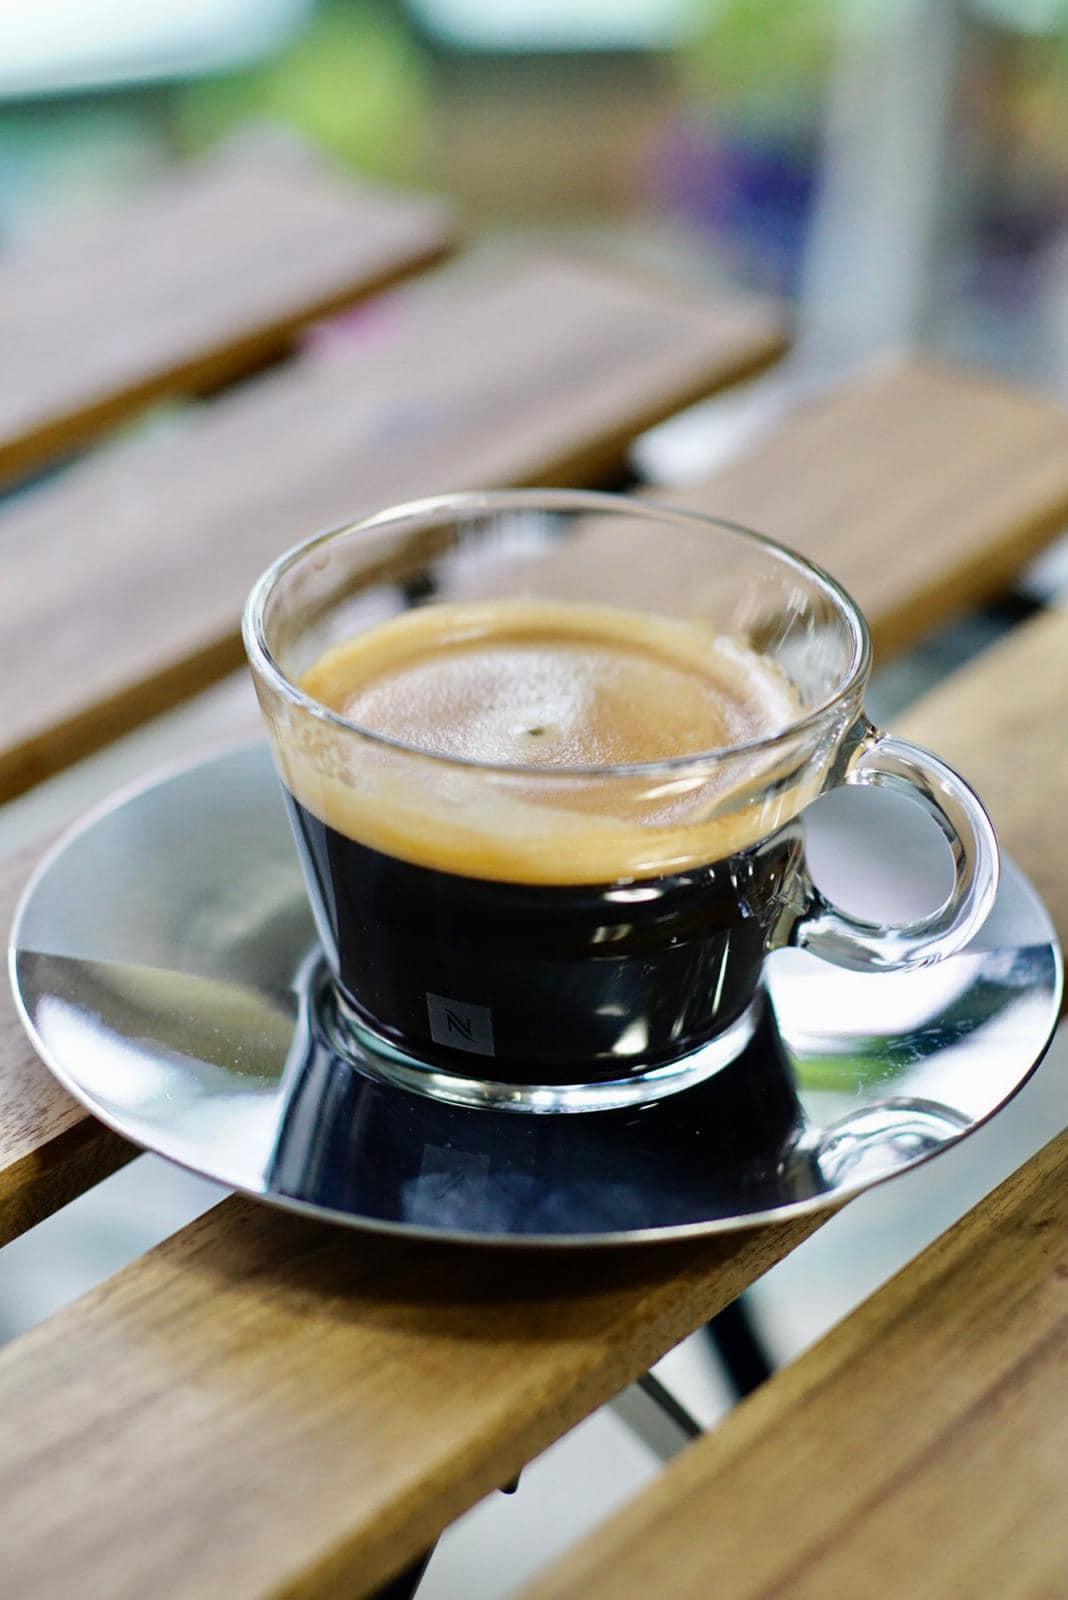 5 Reasons to Drink Black Coffee